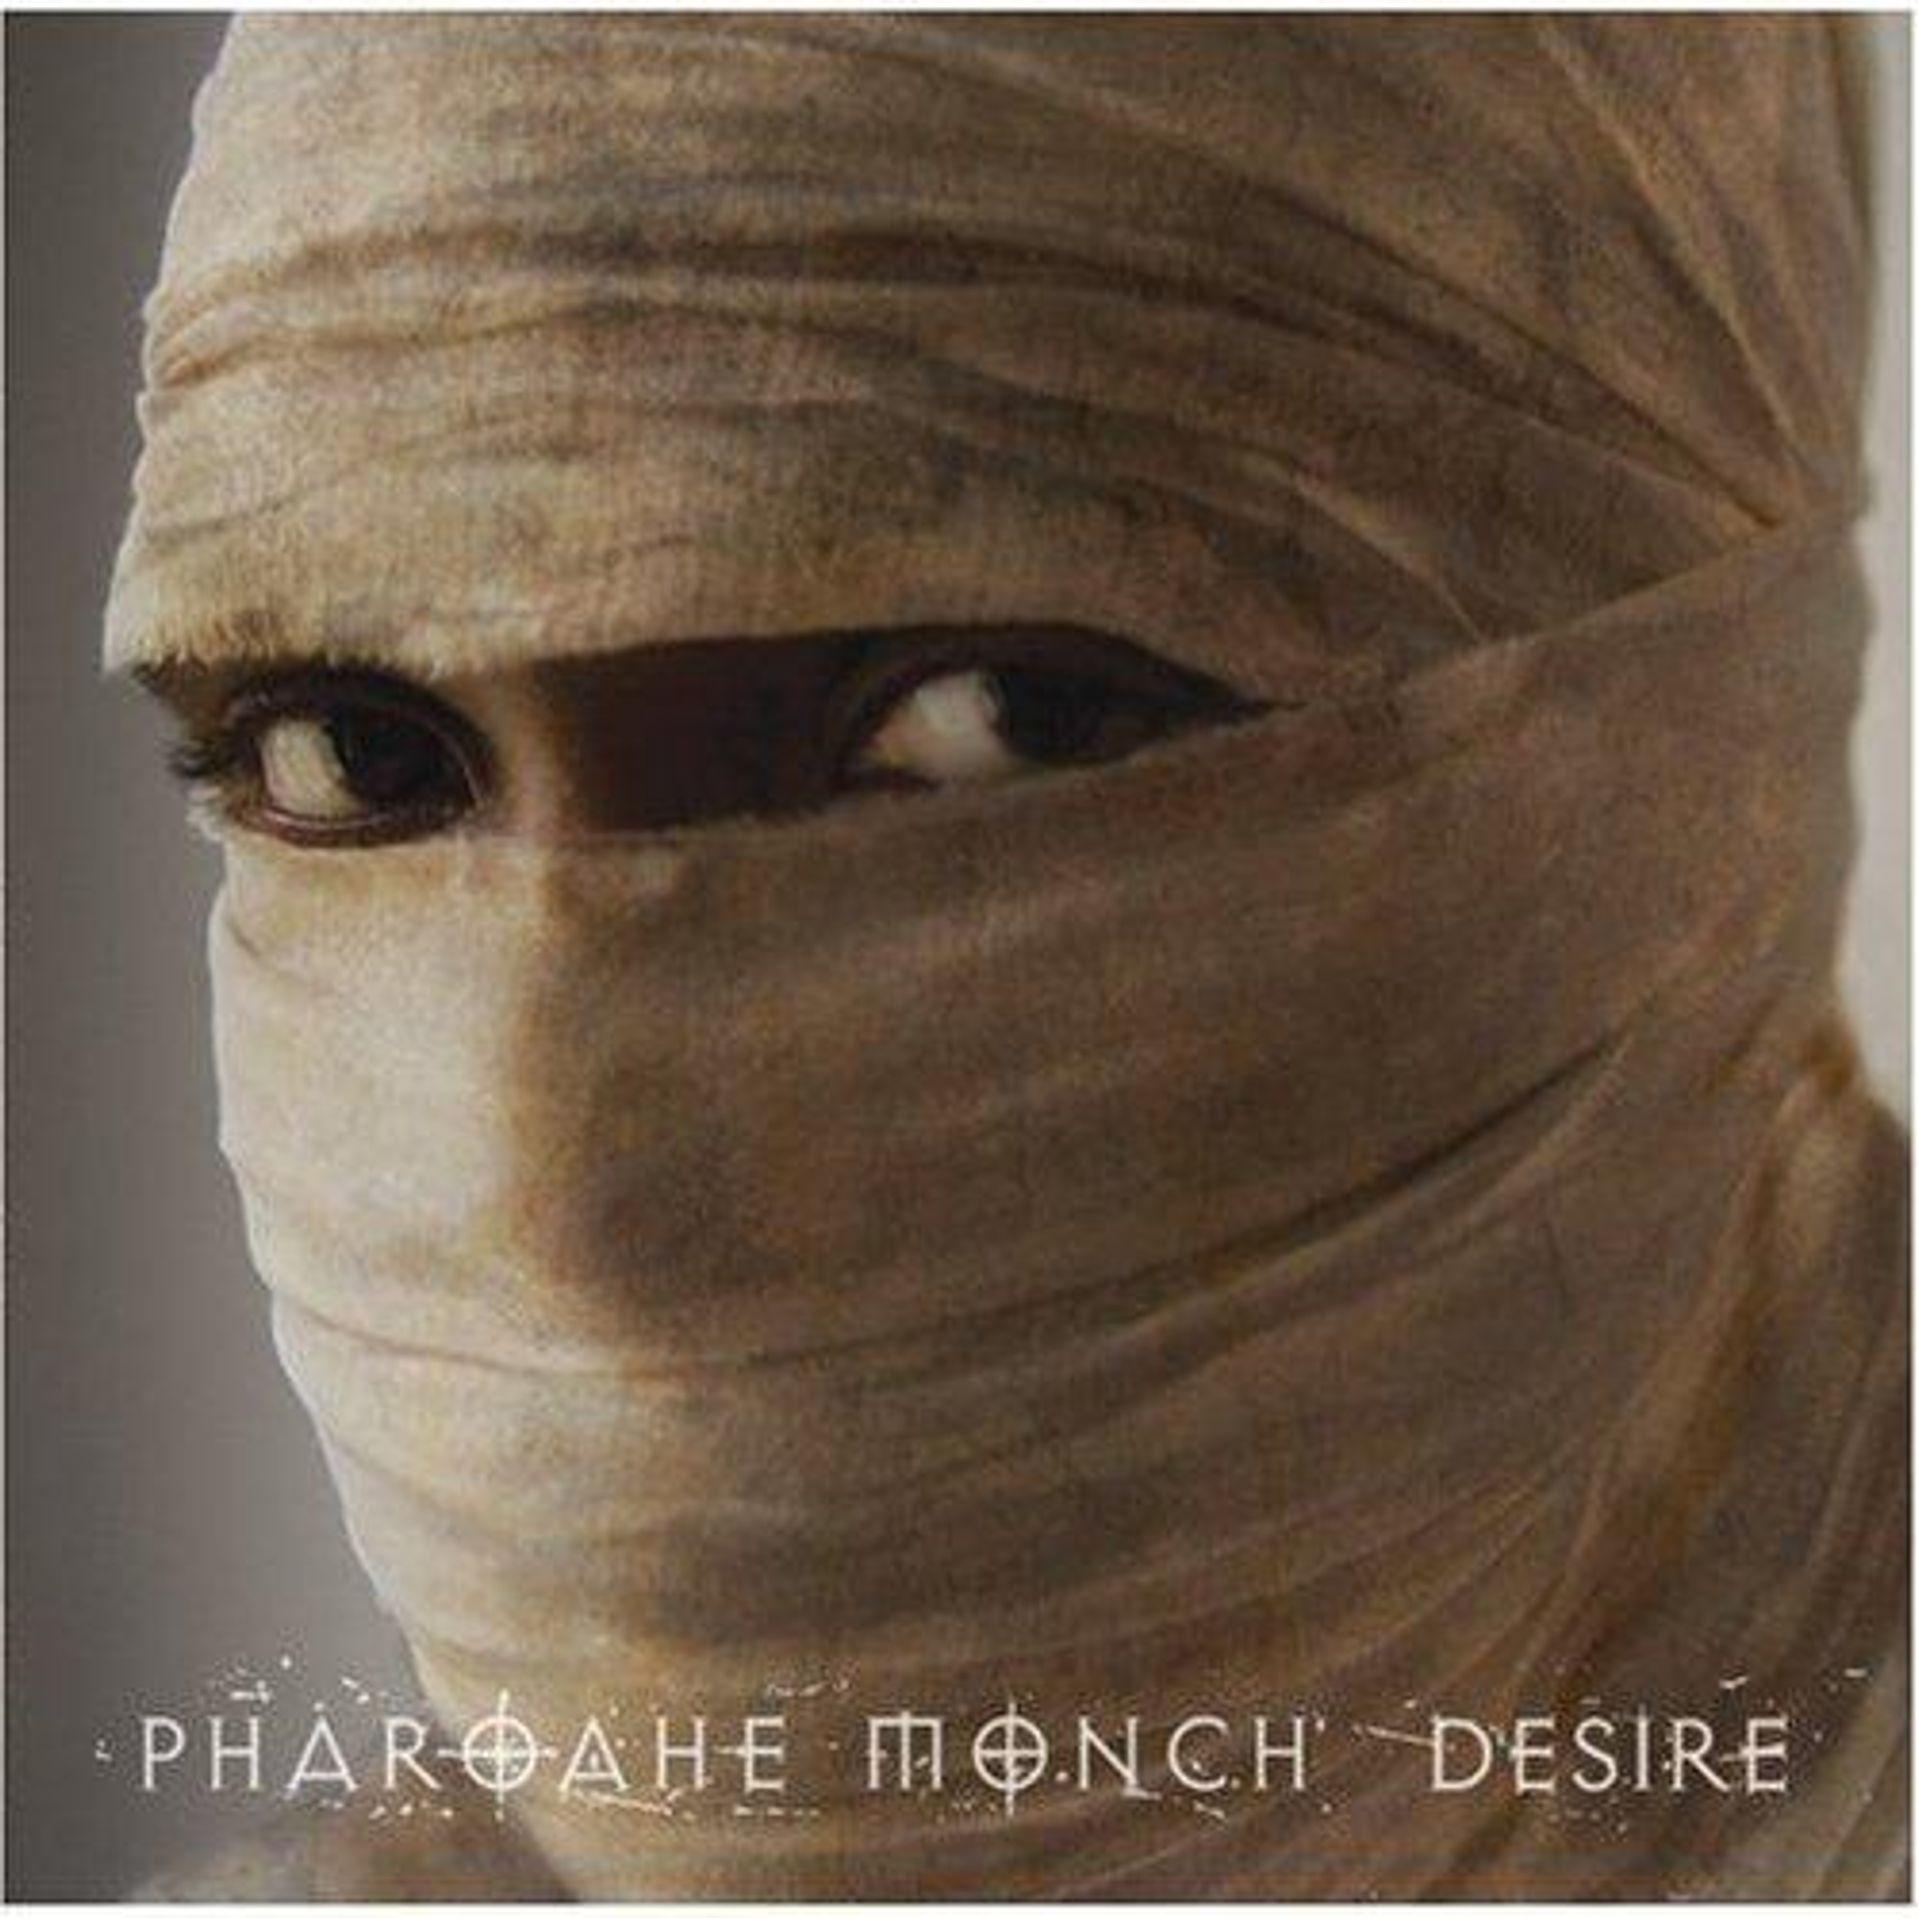 Album Title: Desire by: Pharoahe Monch